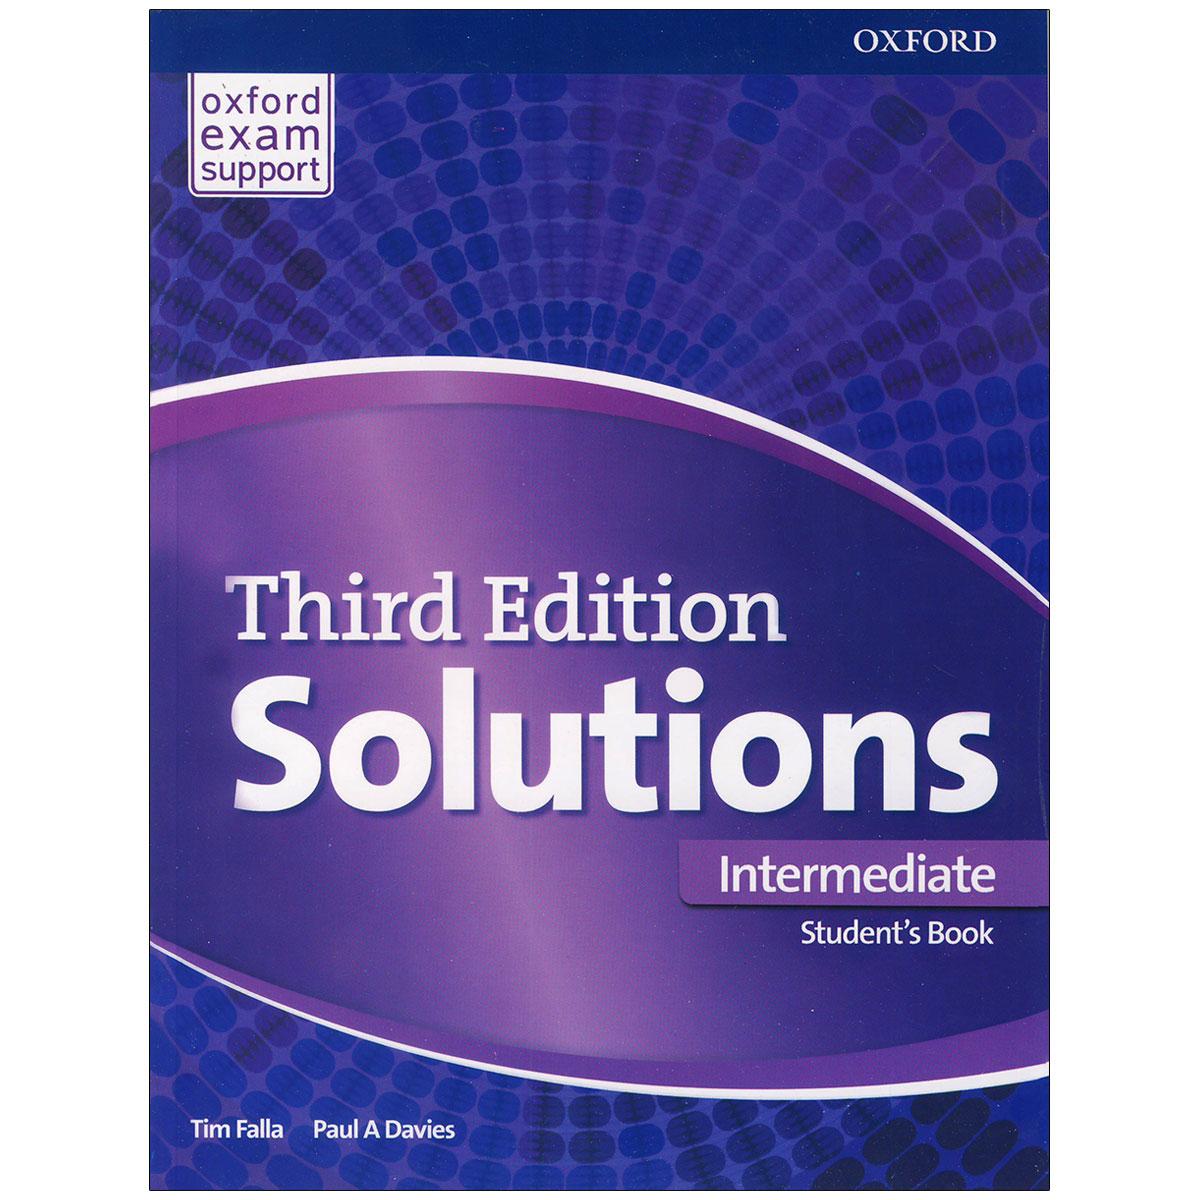 کتاب solutions intermediate اثر Tim Falla and Paul A Davies انتشارات OXFORD